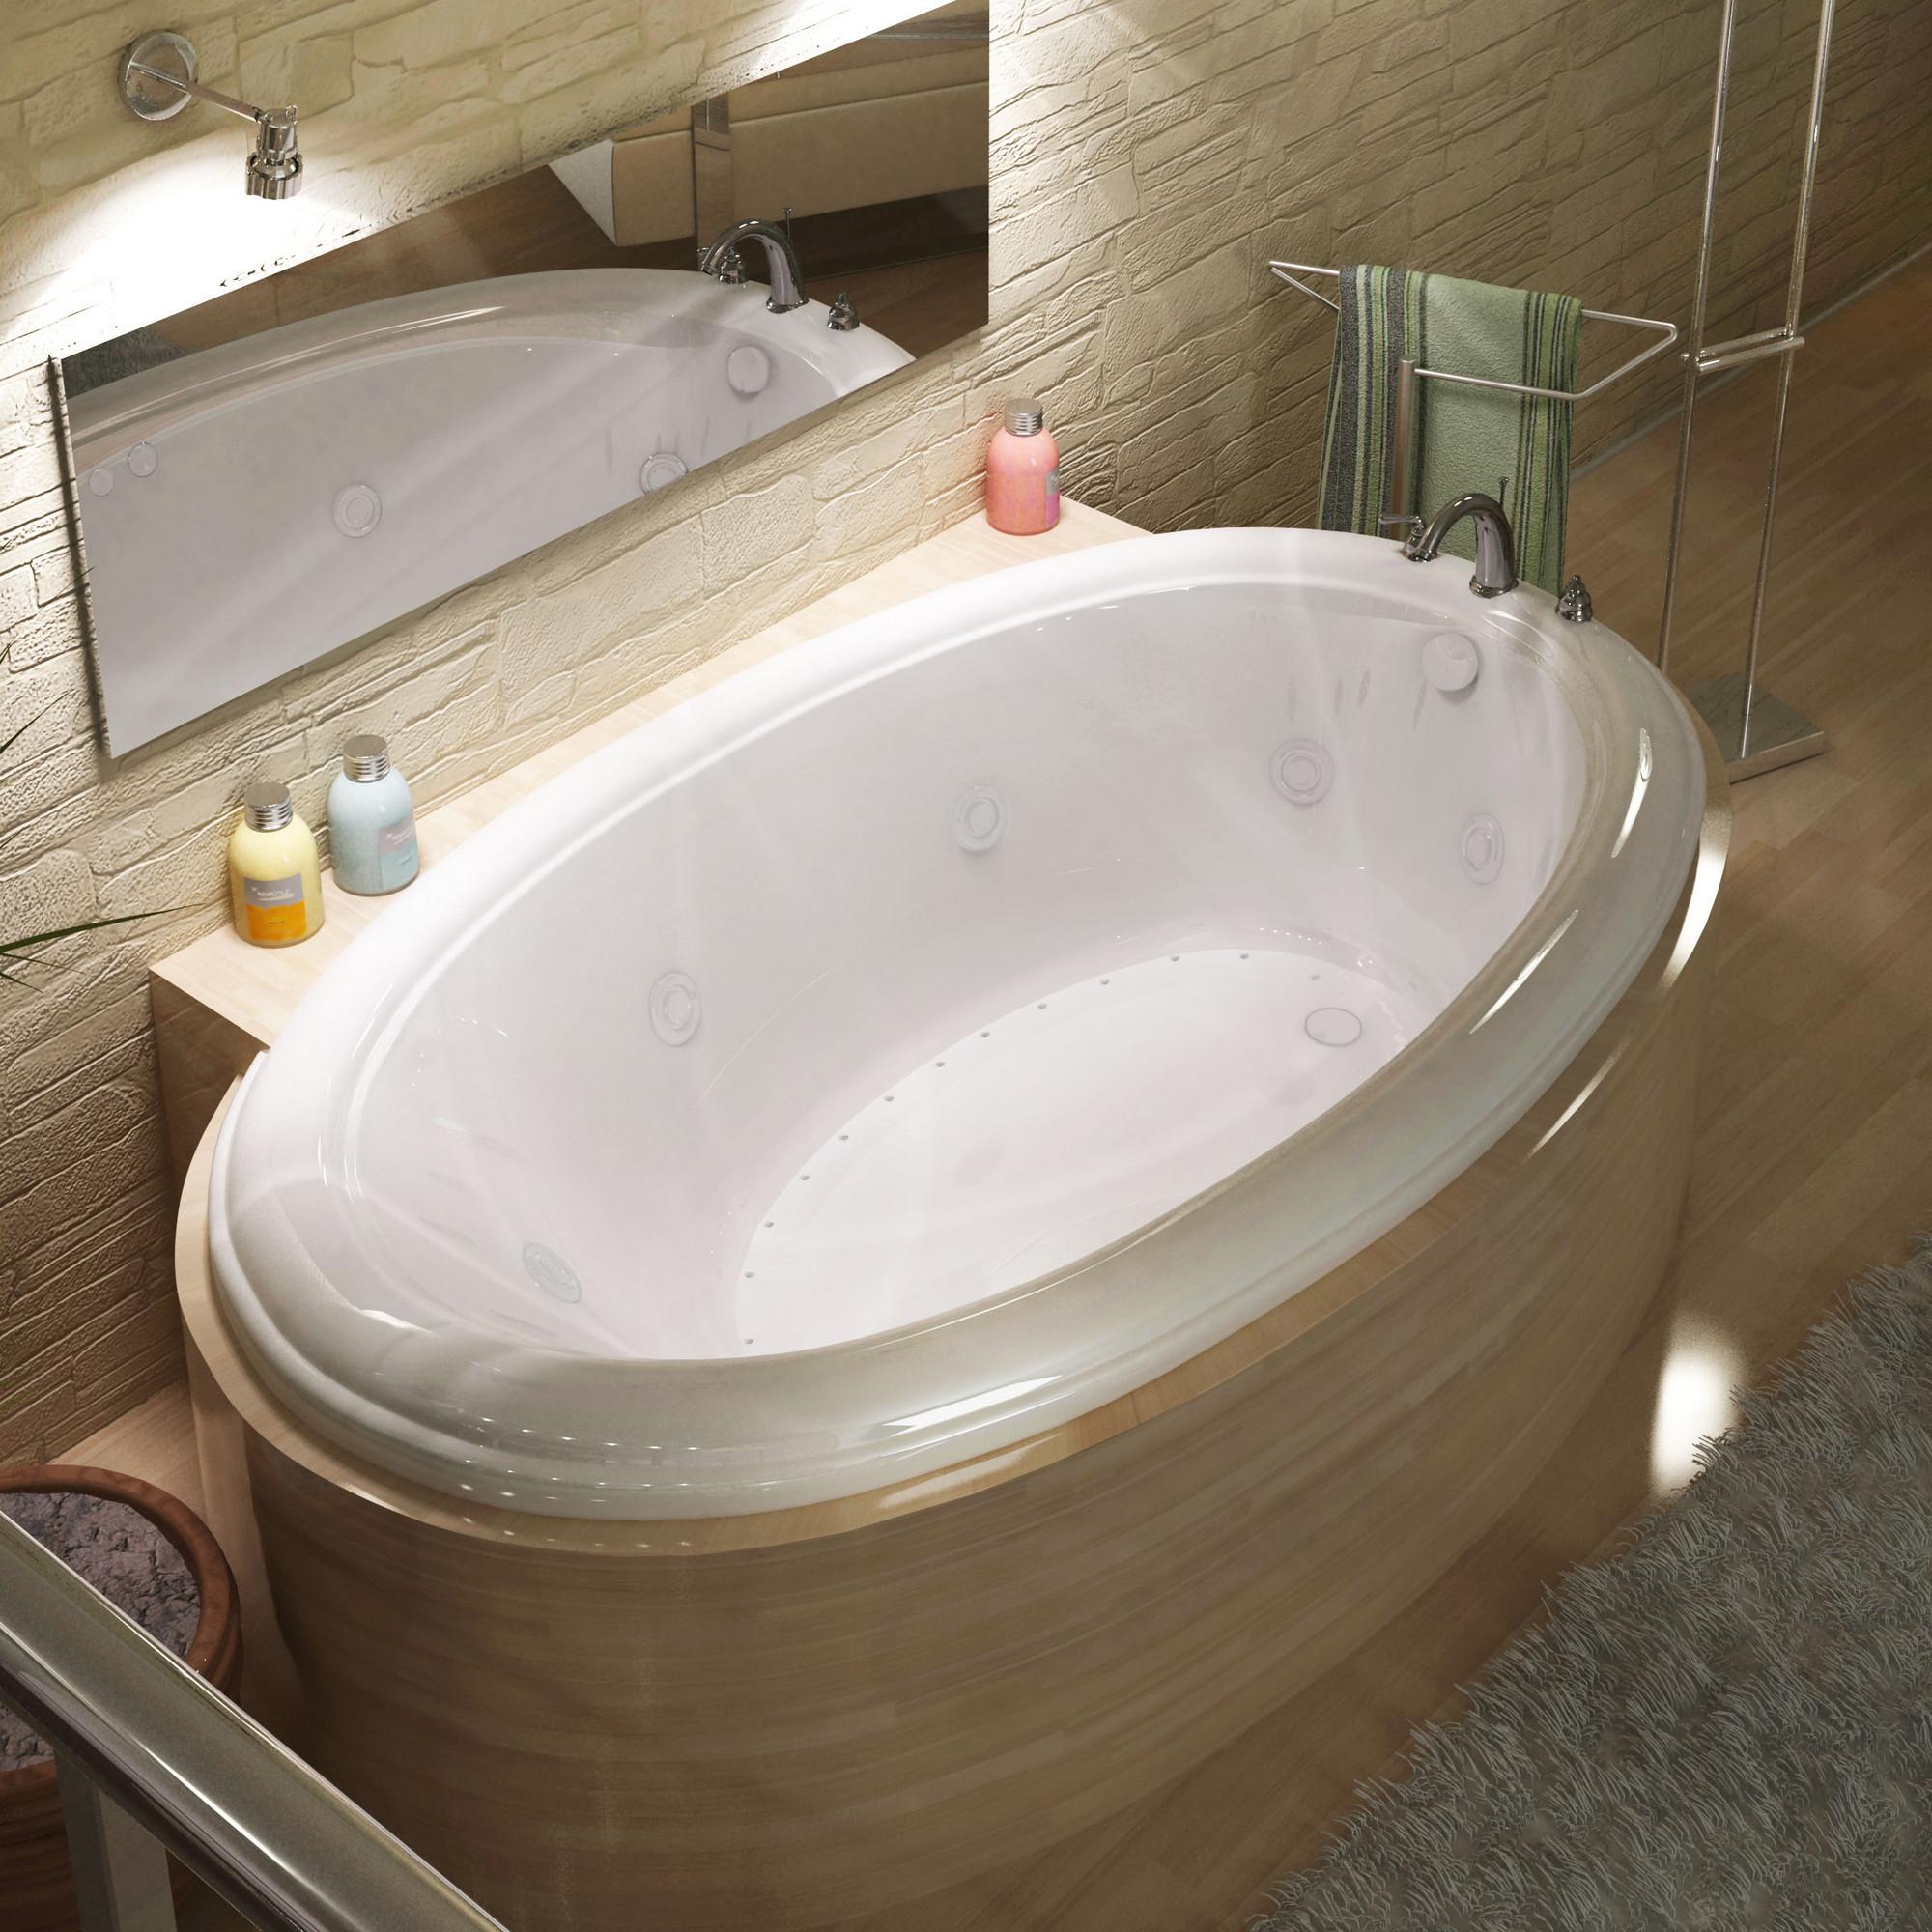 MediTub 4478PCDR Atlantis Petite Oval Air & Whirlpool Tub With Right Pump